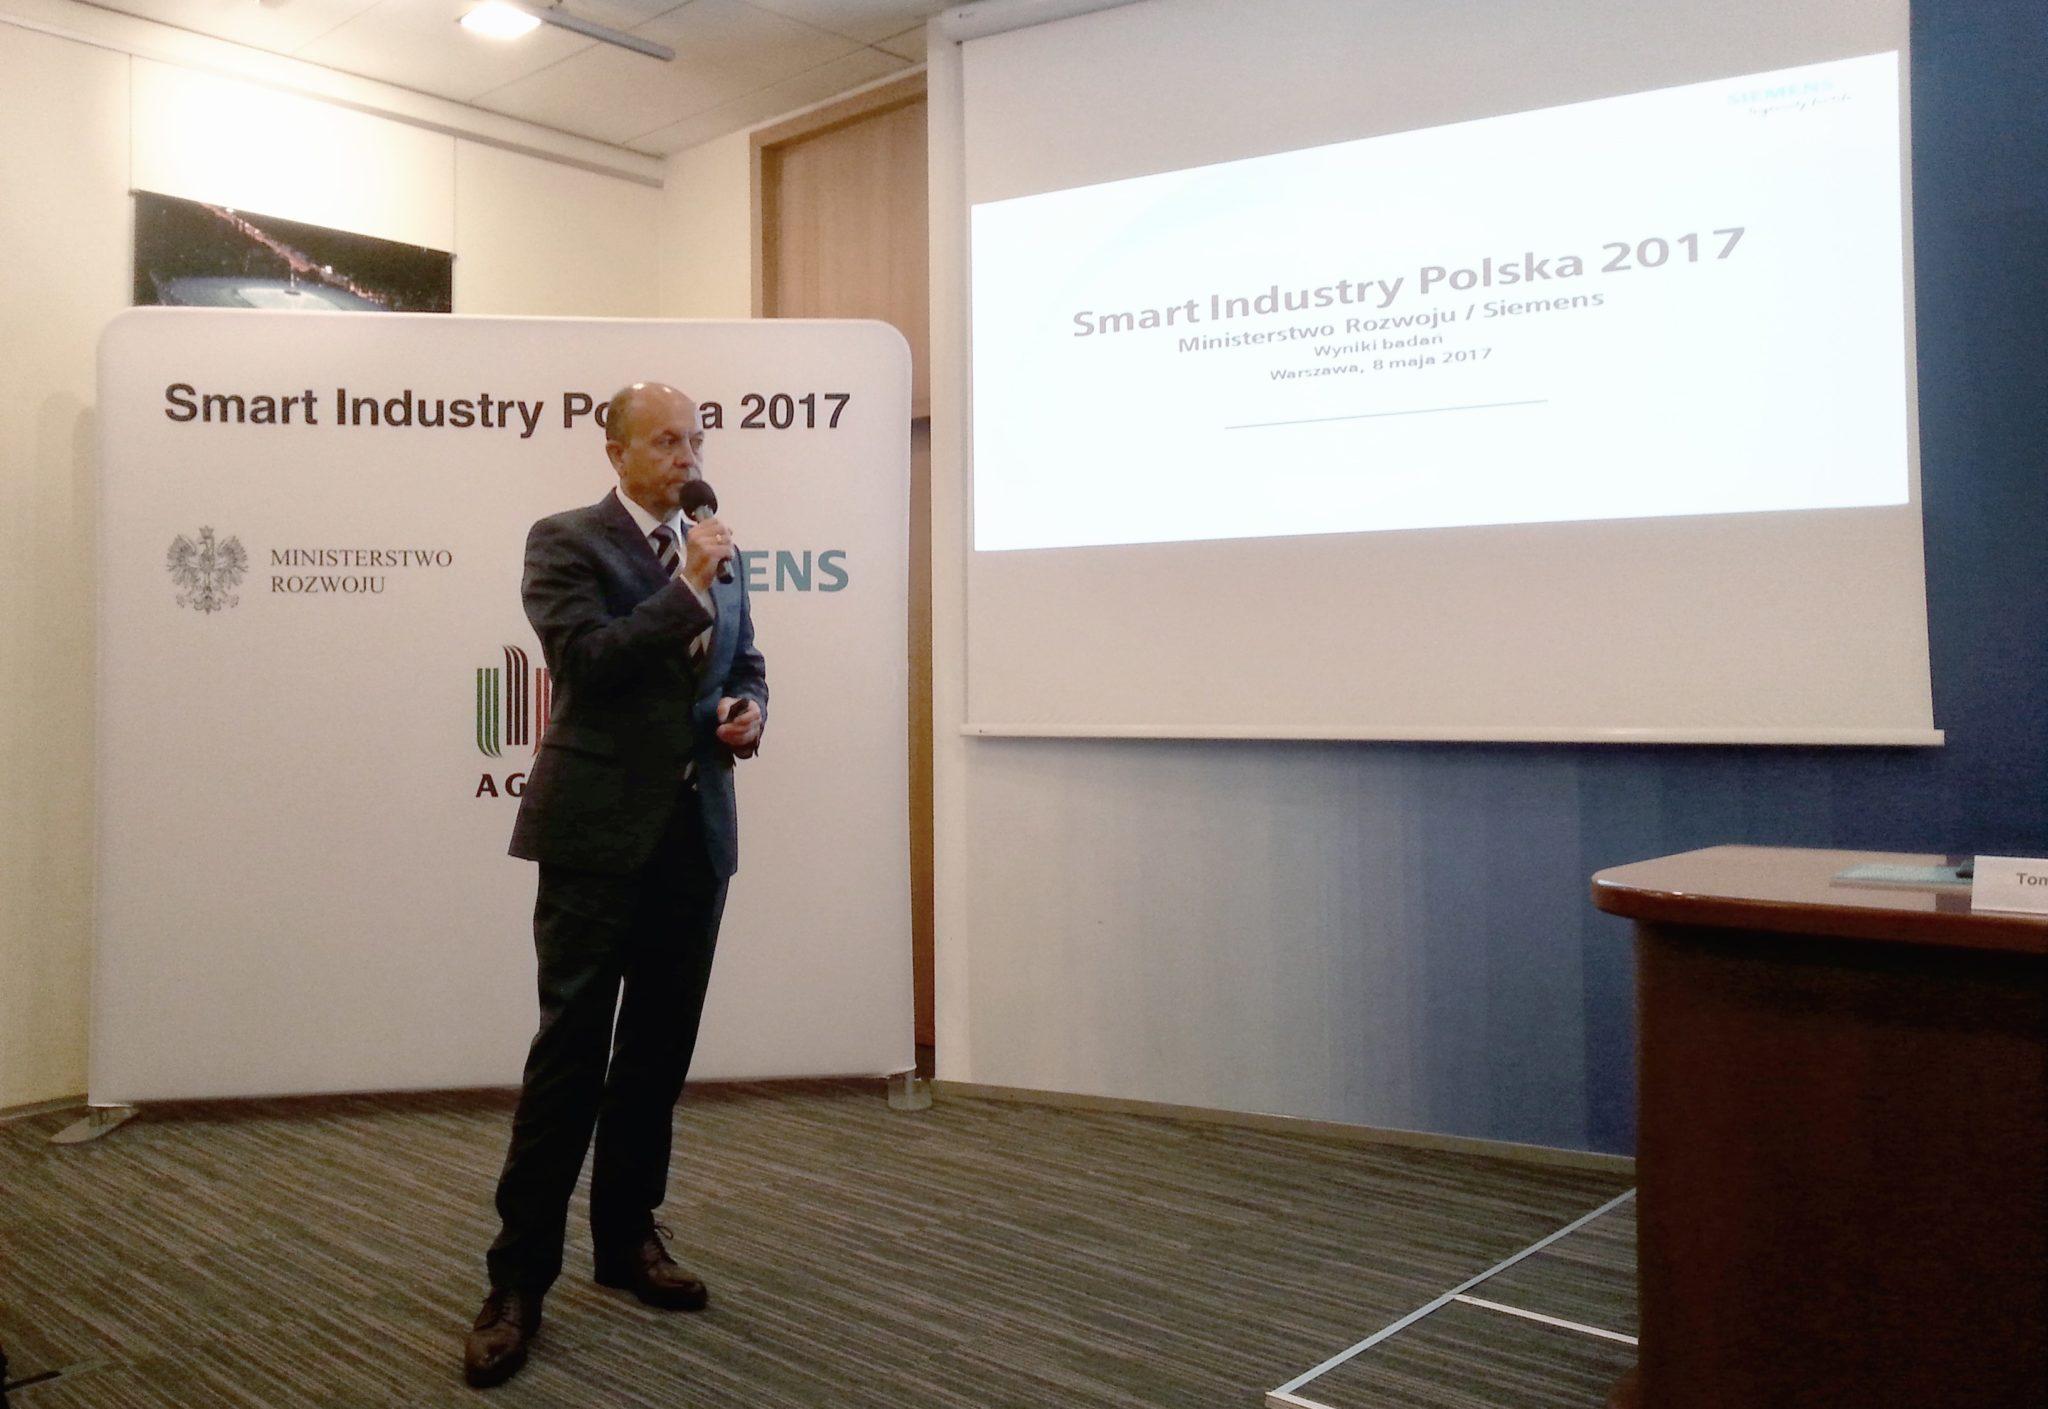 Smart Industry Polska 2017